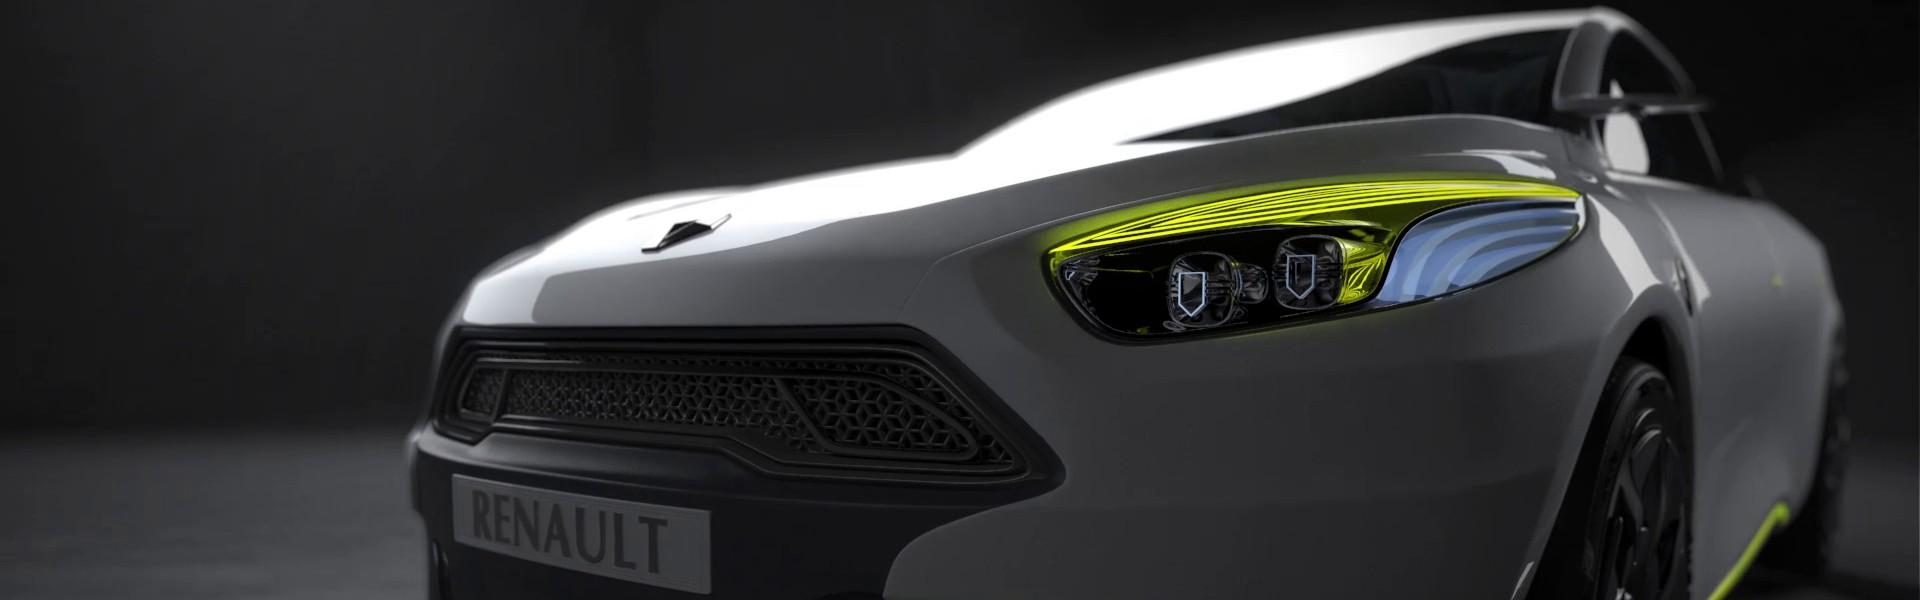 Concept Car Renault Fluence